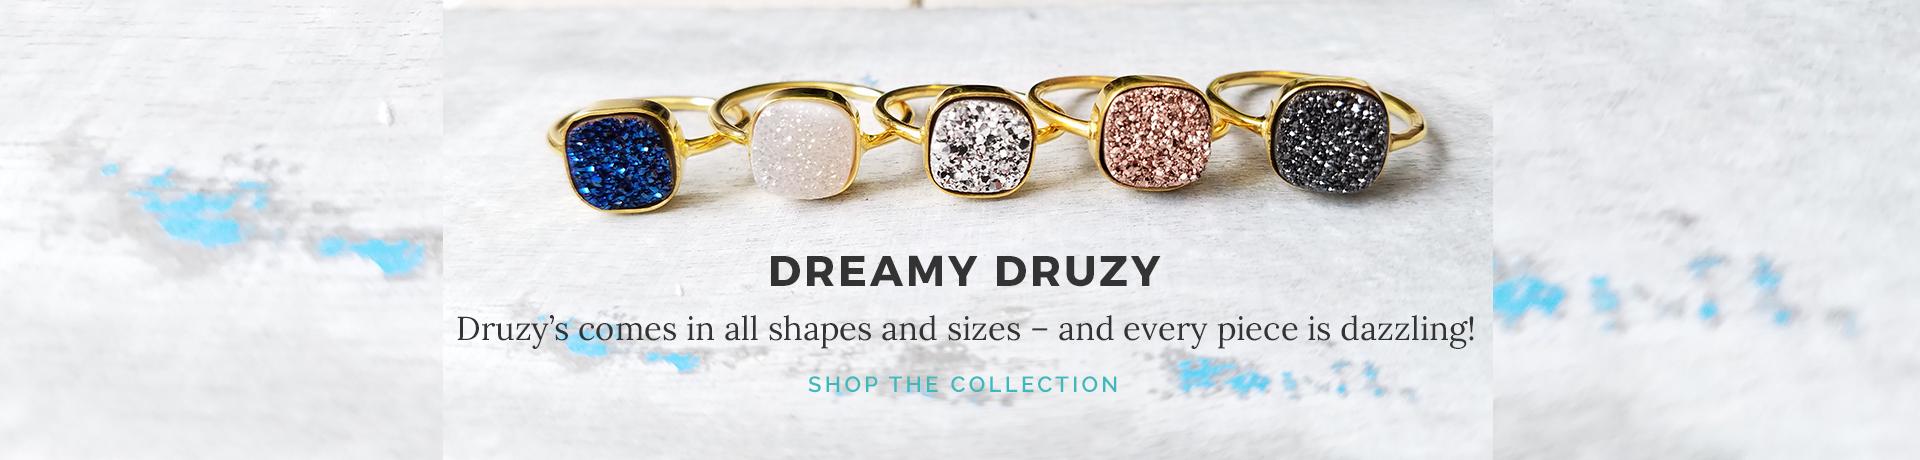 Wholesale Handmade Jewelry store, Wholesale designer artisan